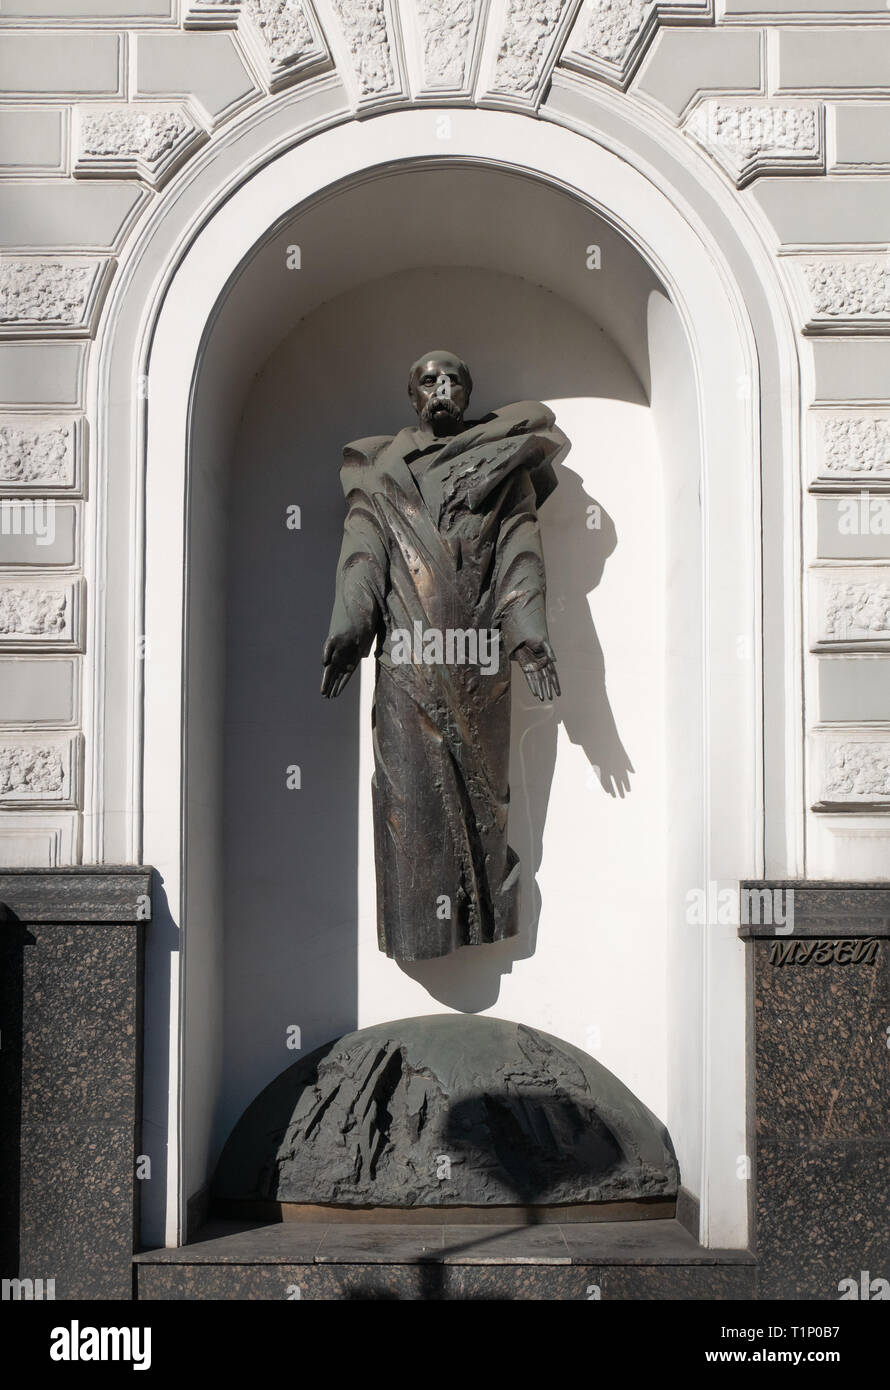 KYIV, UKRAINE - MARCH 13, 2019: Monument of greatest ukrainian poet, writer, painter, artist, public and political figure Taras Shevchenko near Nation - Stock Image